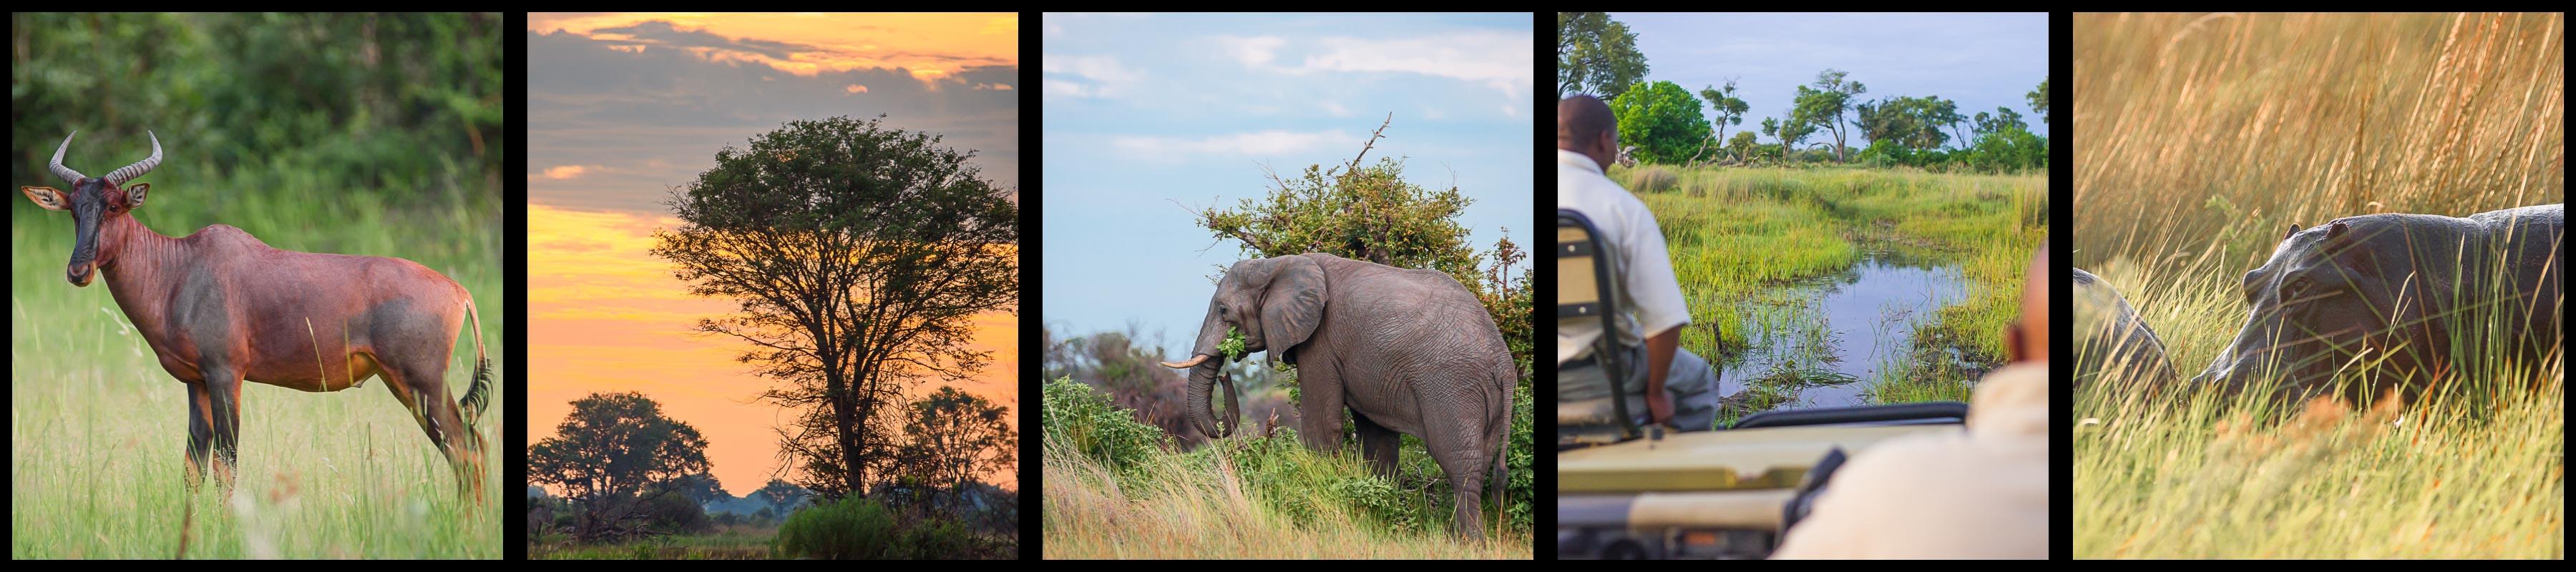 Sunrise Safari in the Okavango Delta